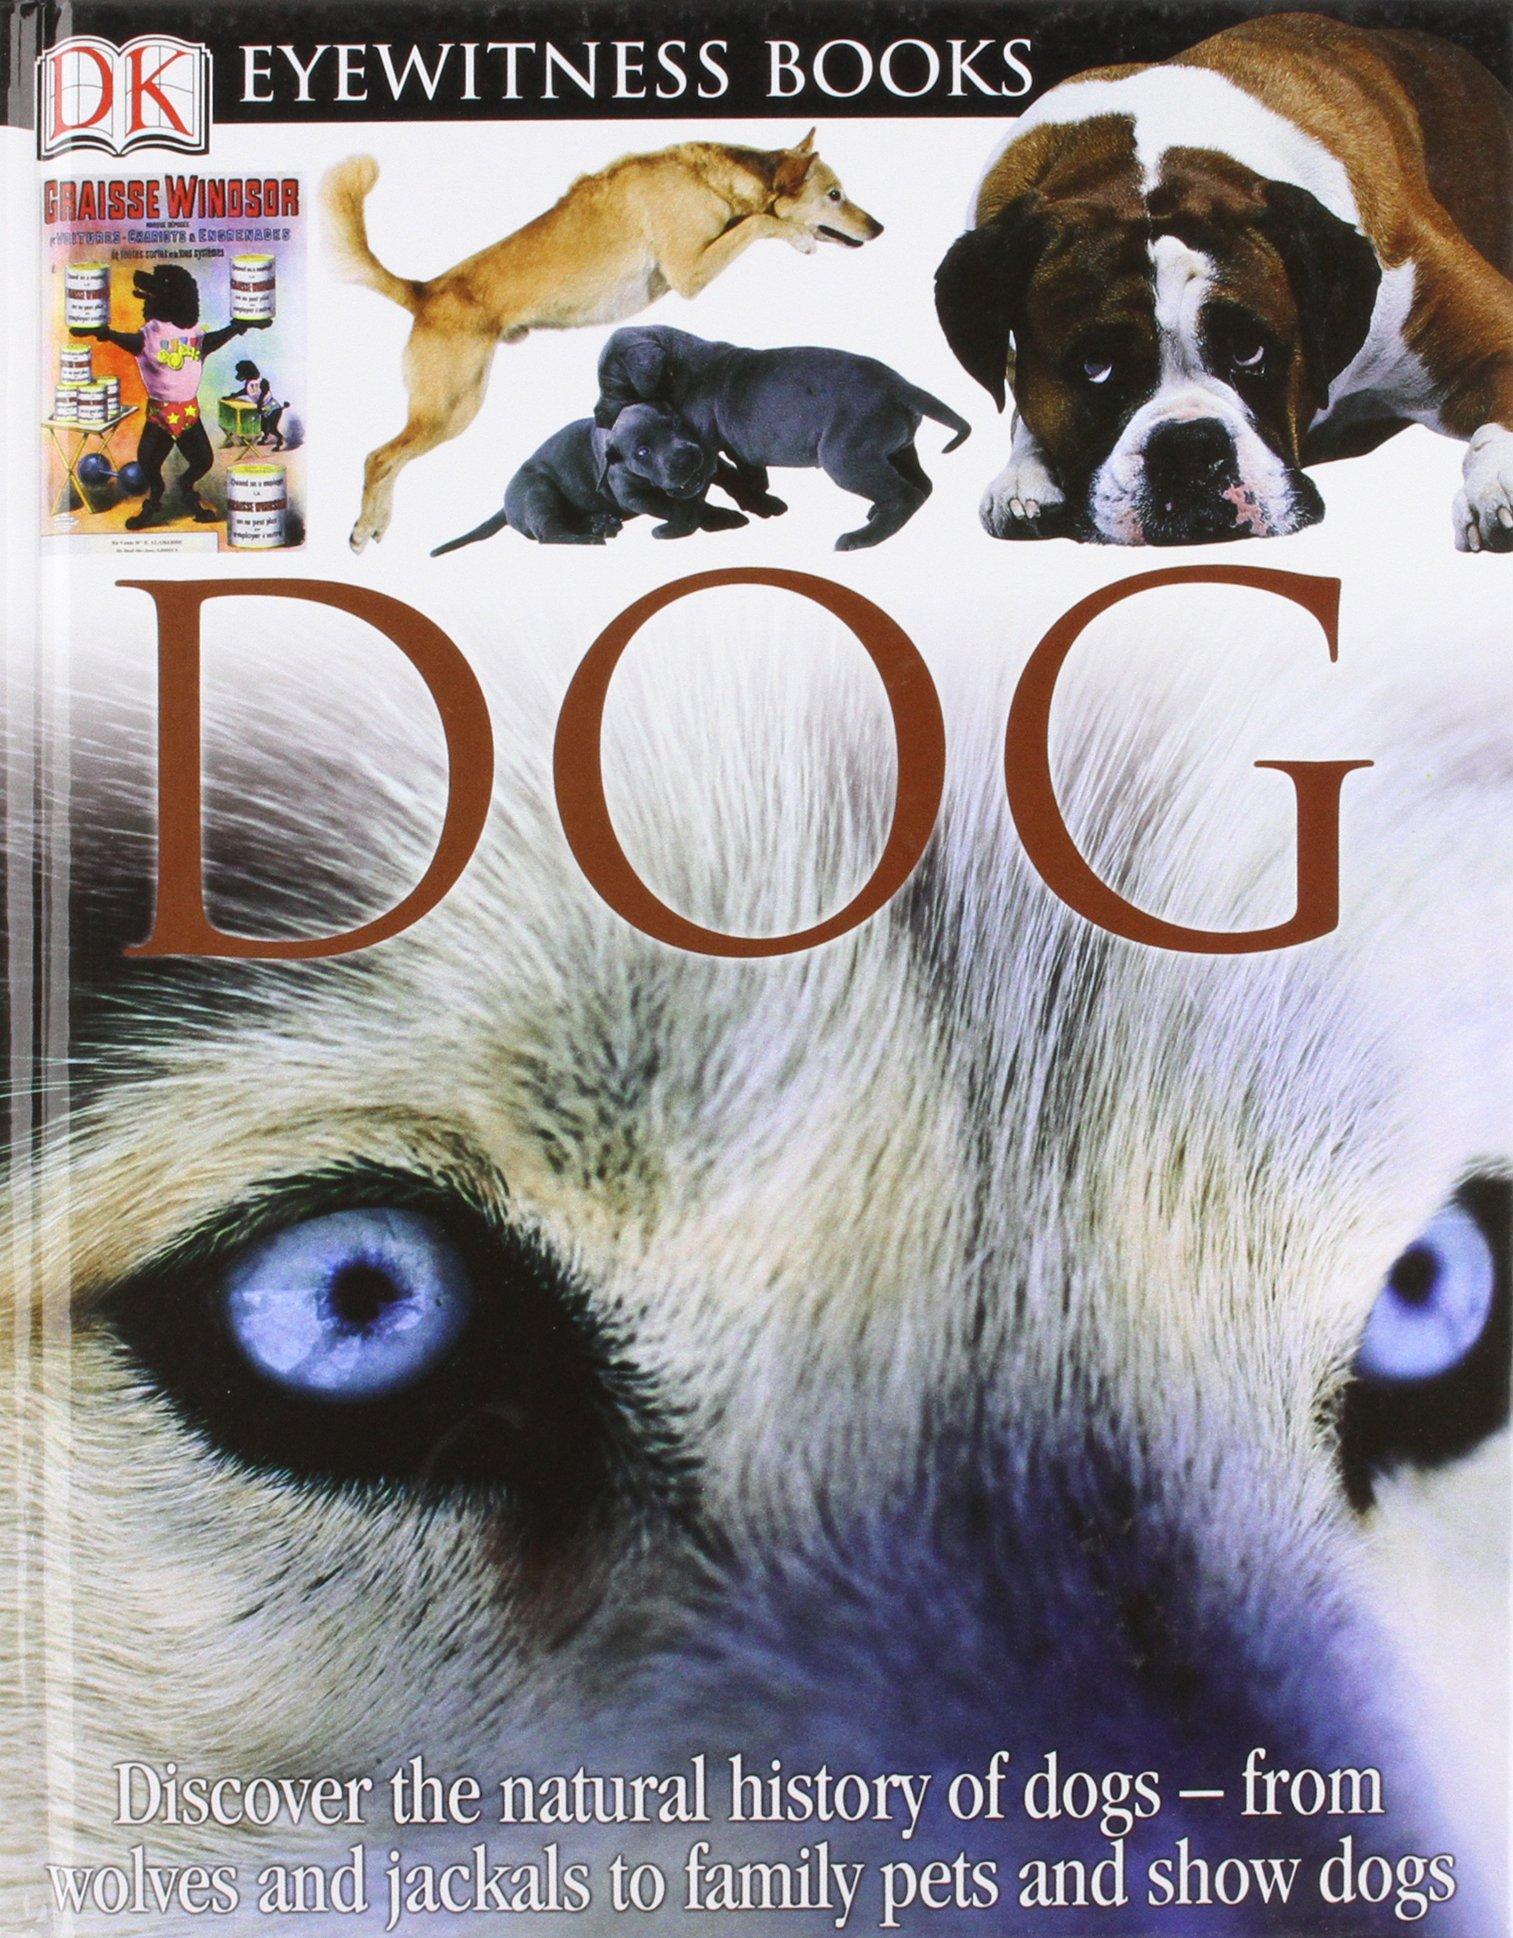 Download DK Eyewitness Books: Dog PDF ePub fb2 ebook